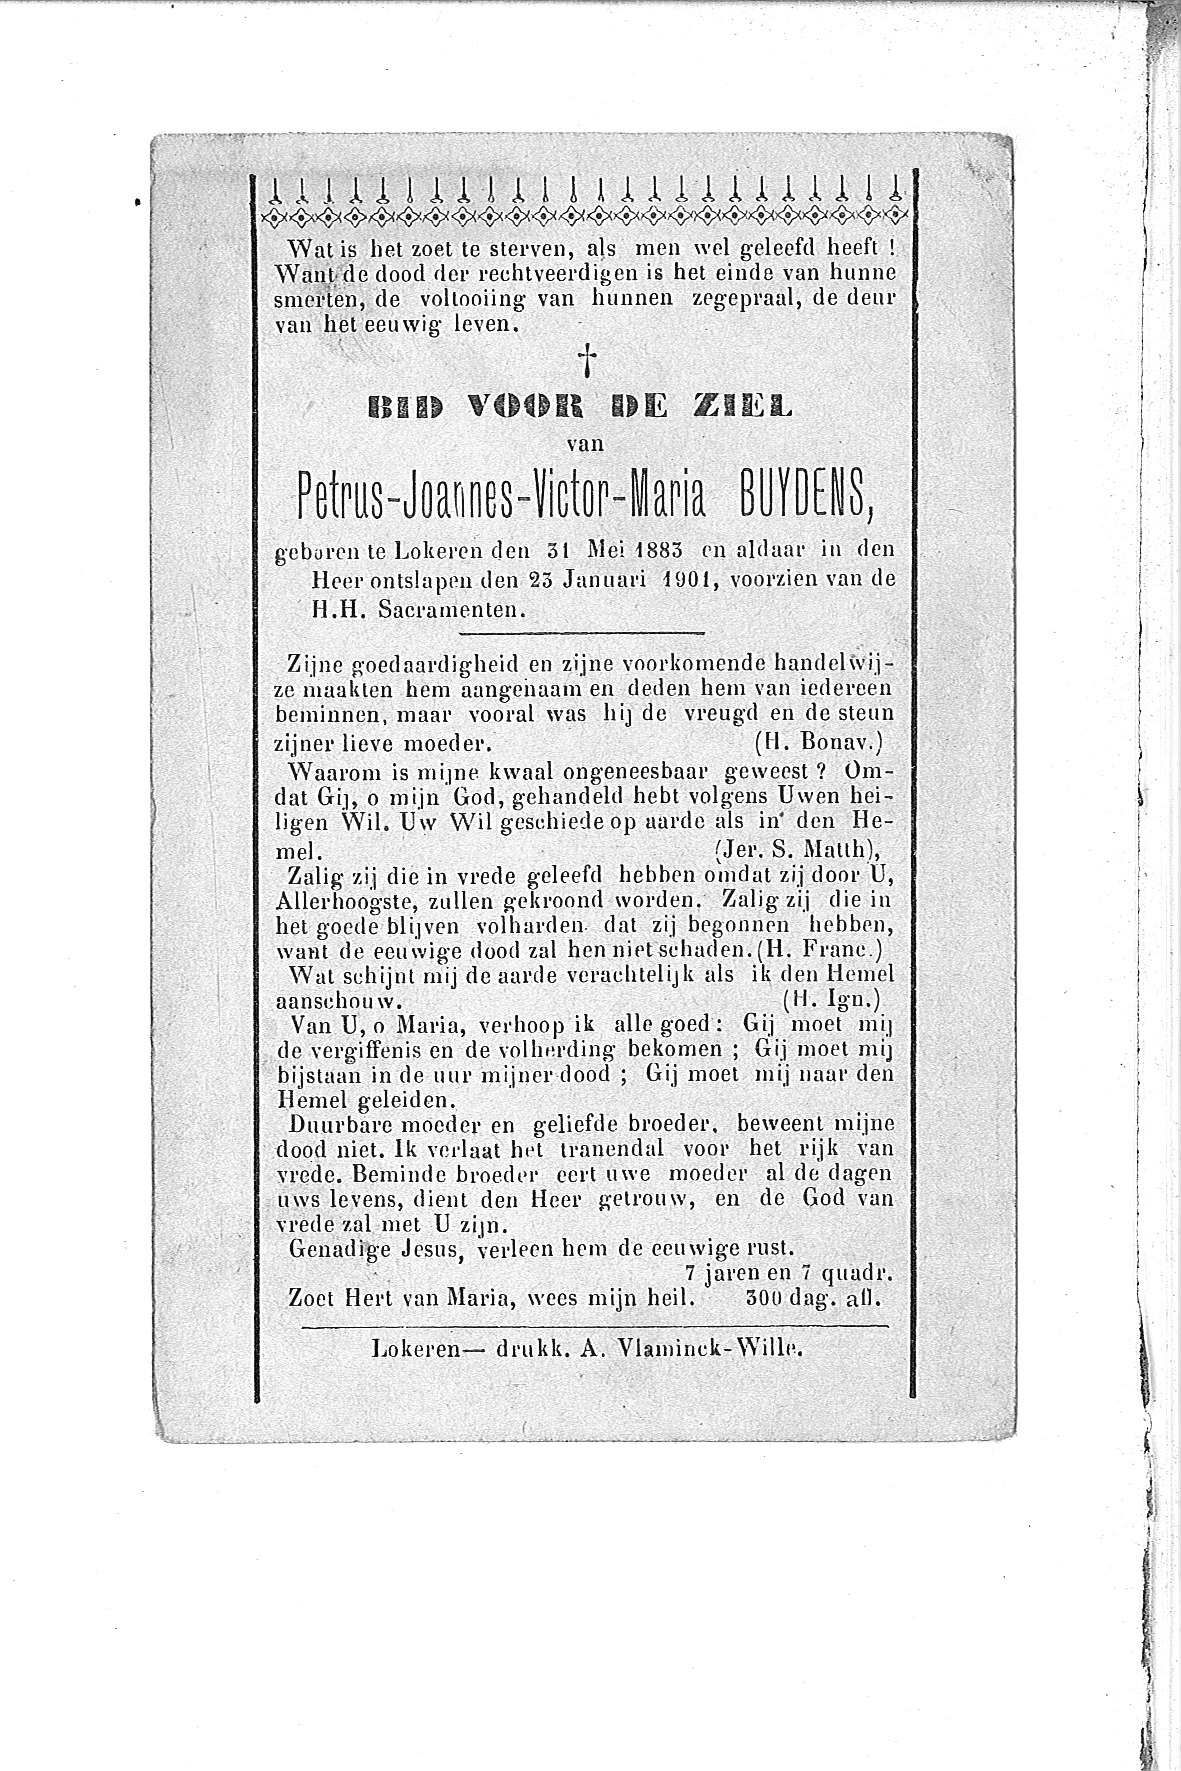 Petrus-Joannes-Victor-Maria (1901) 20110819122144_00071.jpg